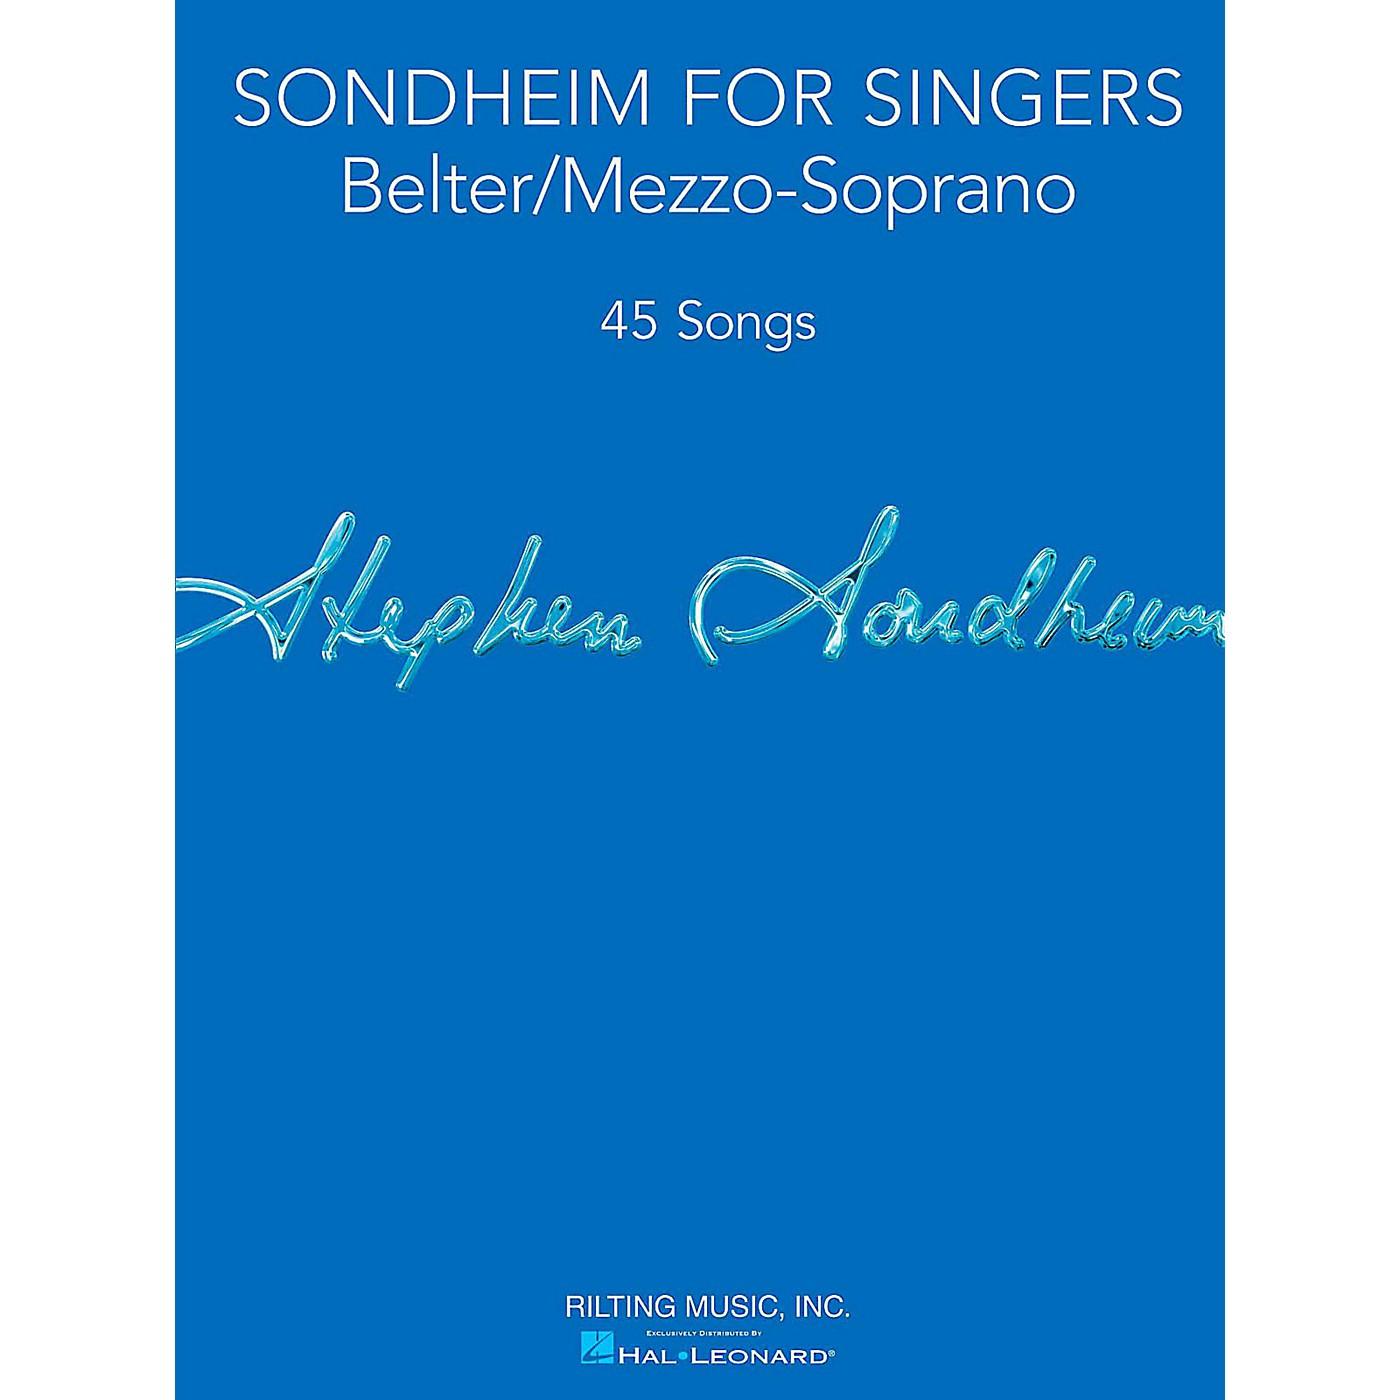 Hal Leonard Sondheim For Singers - Belter/Mezzo-Soprano thumbnail